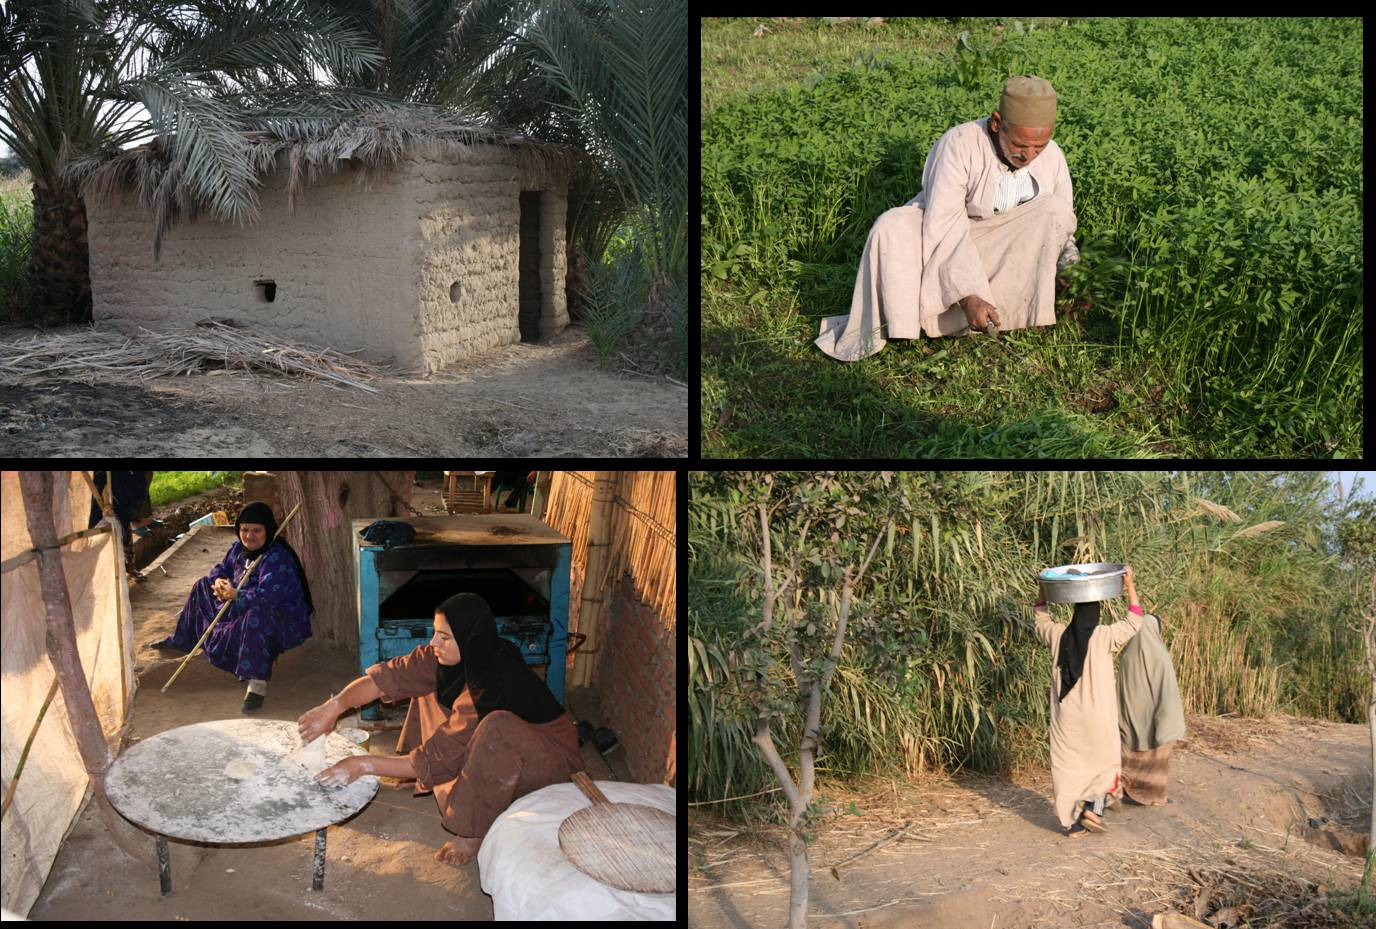 Egyptian farm life